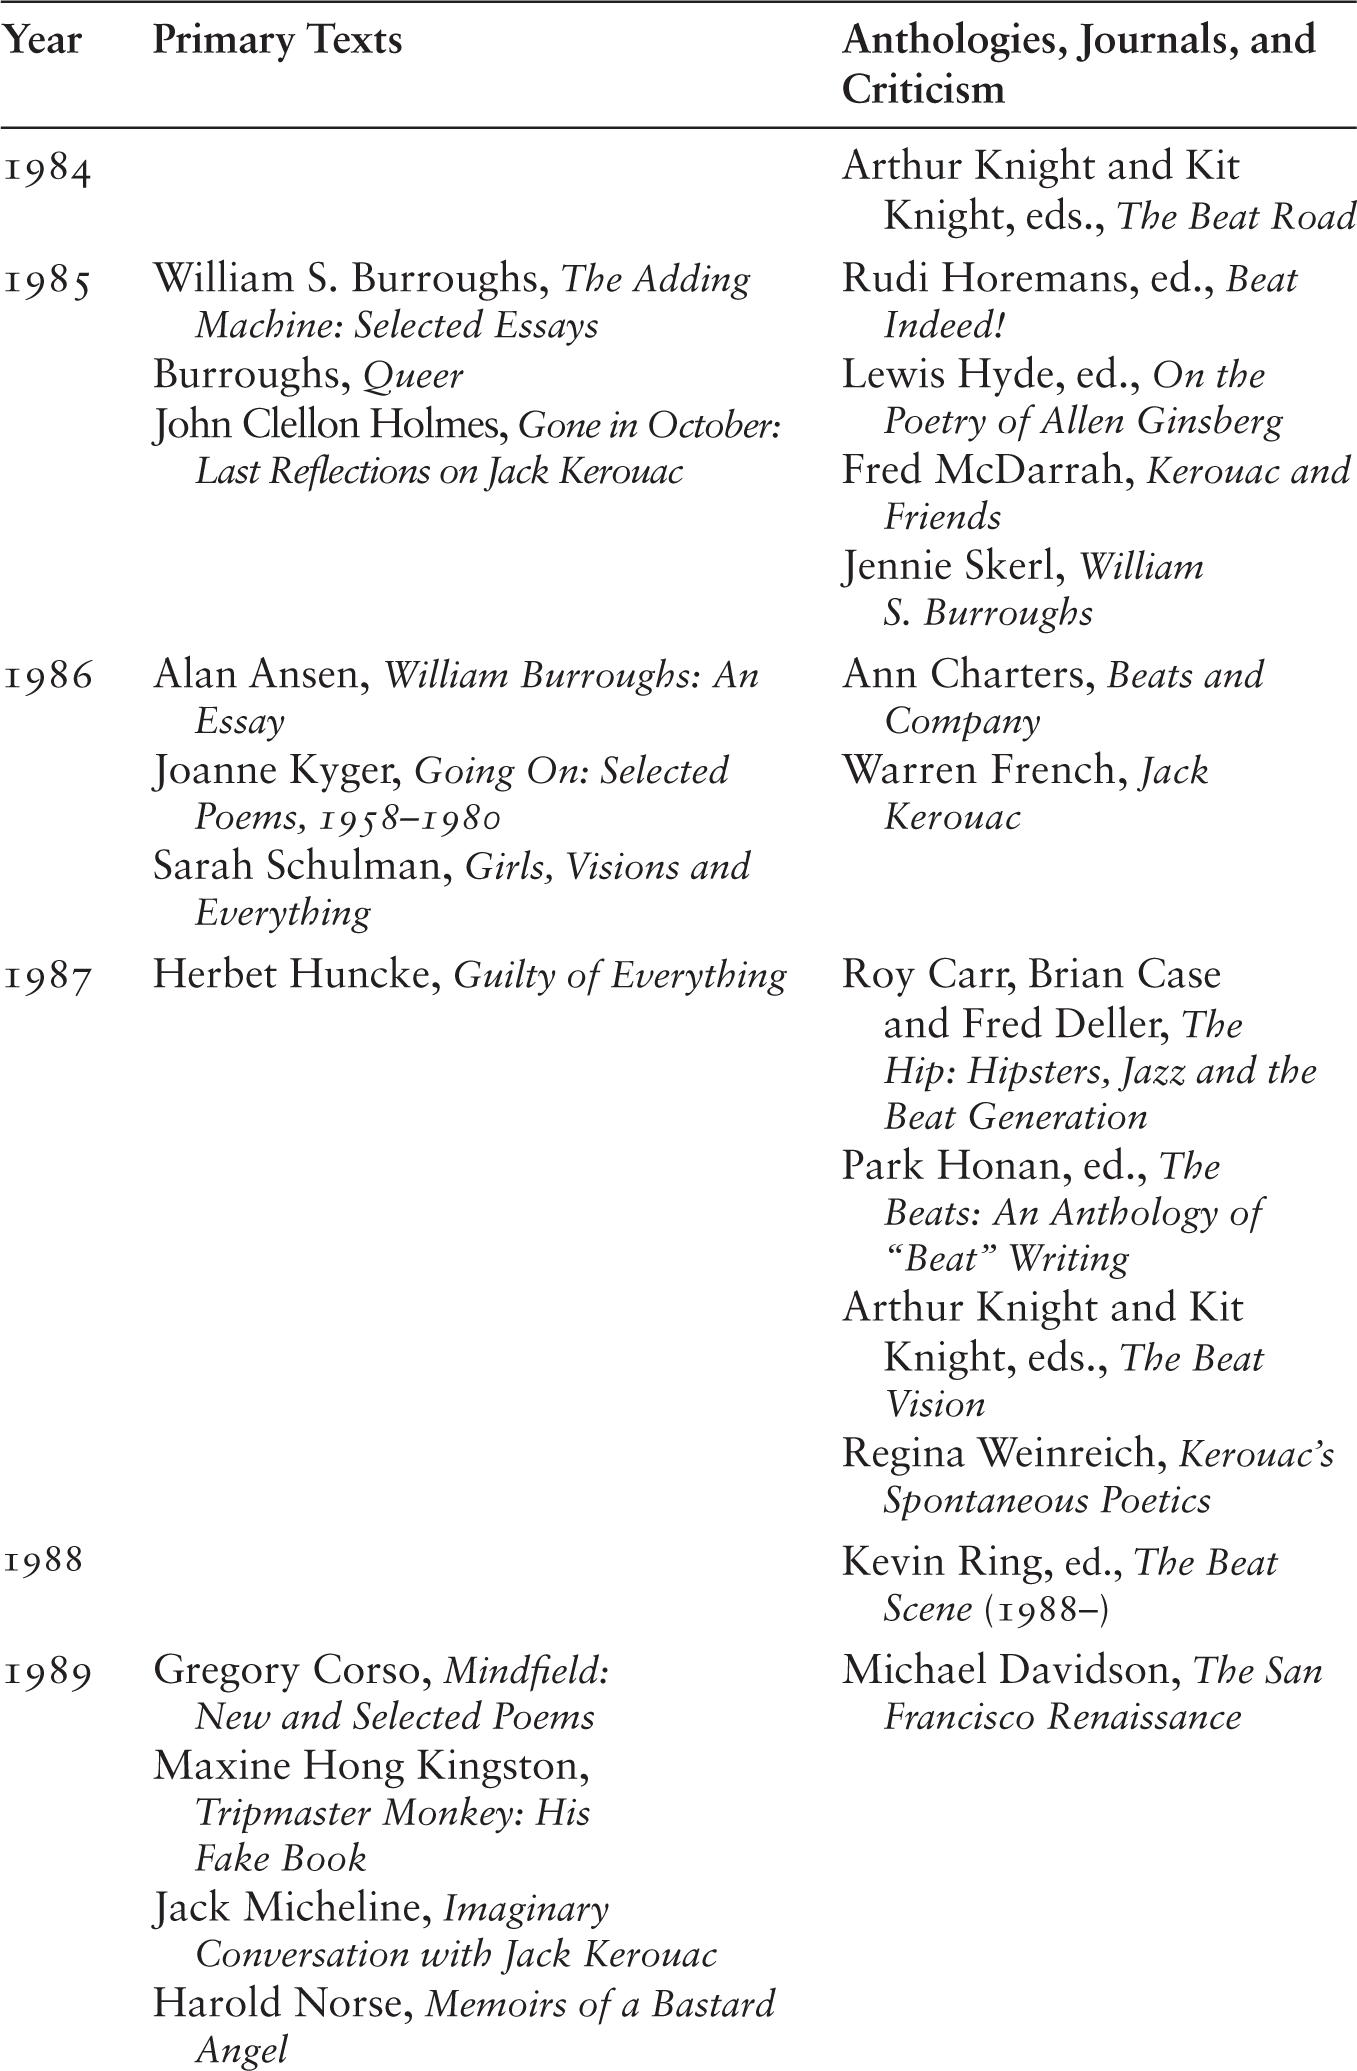 Chronology - The Cambridge Companion to the Beats